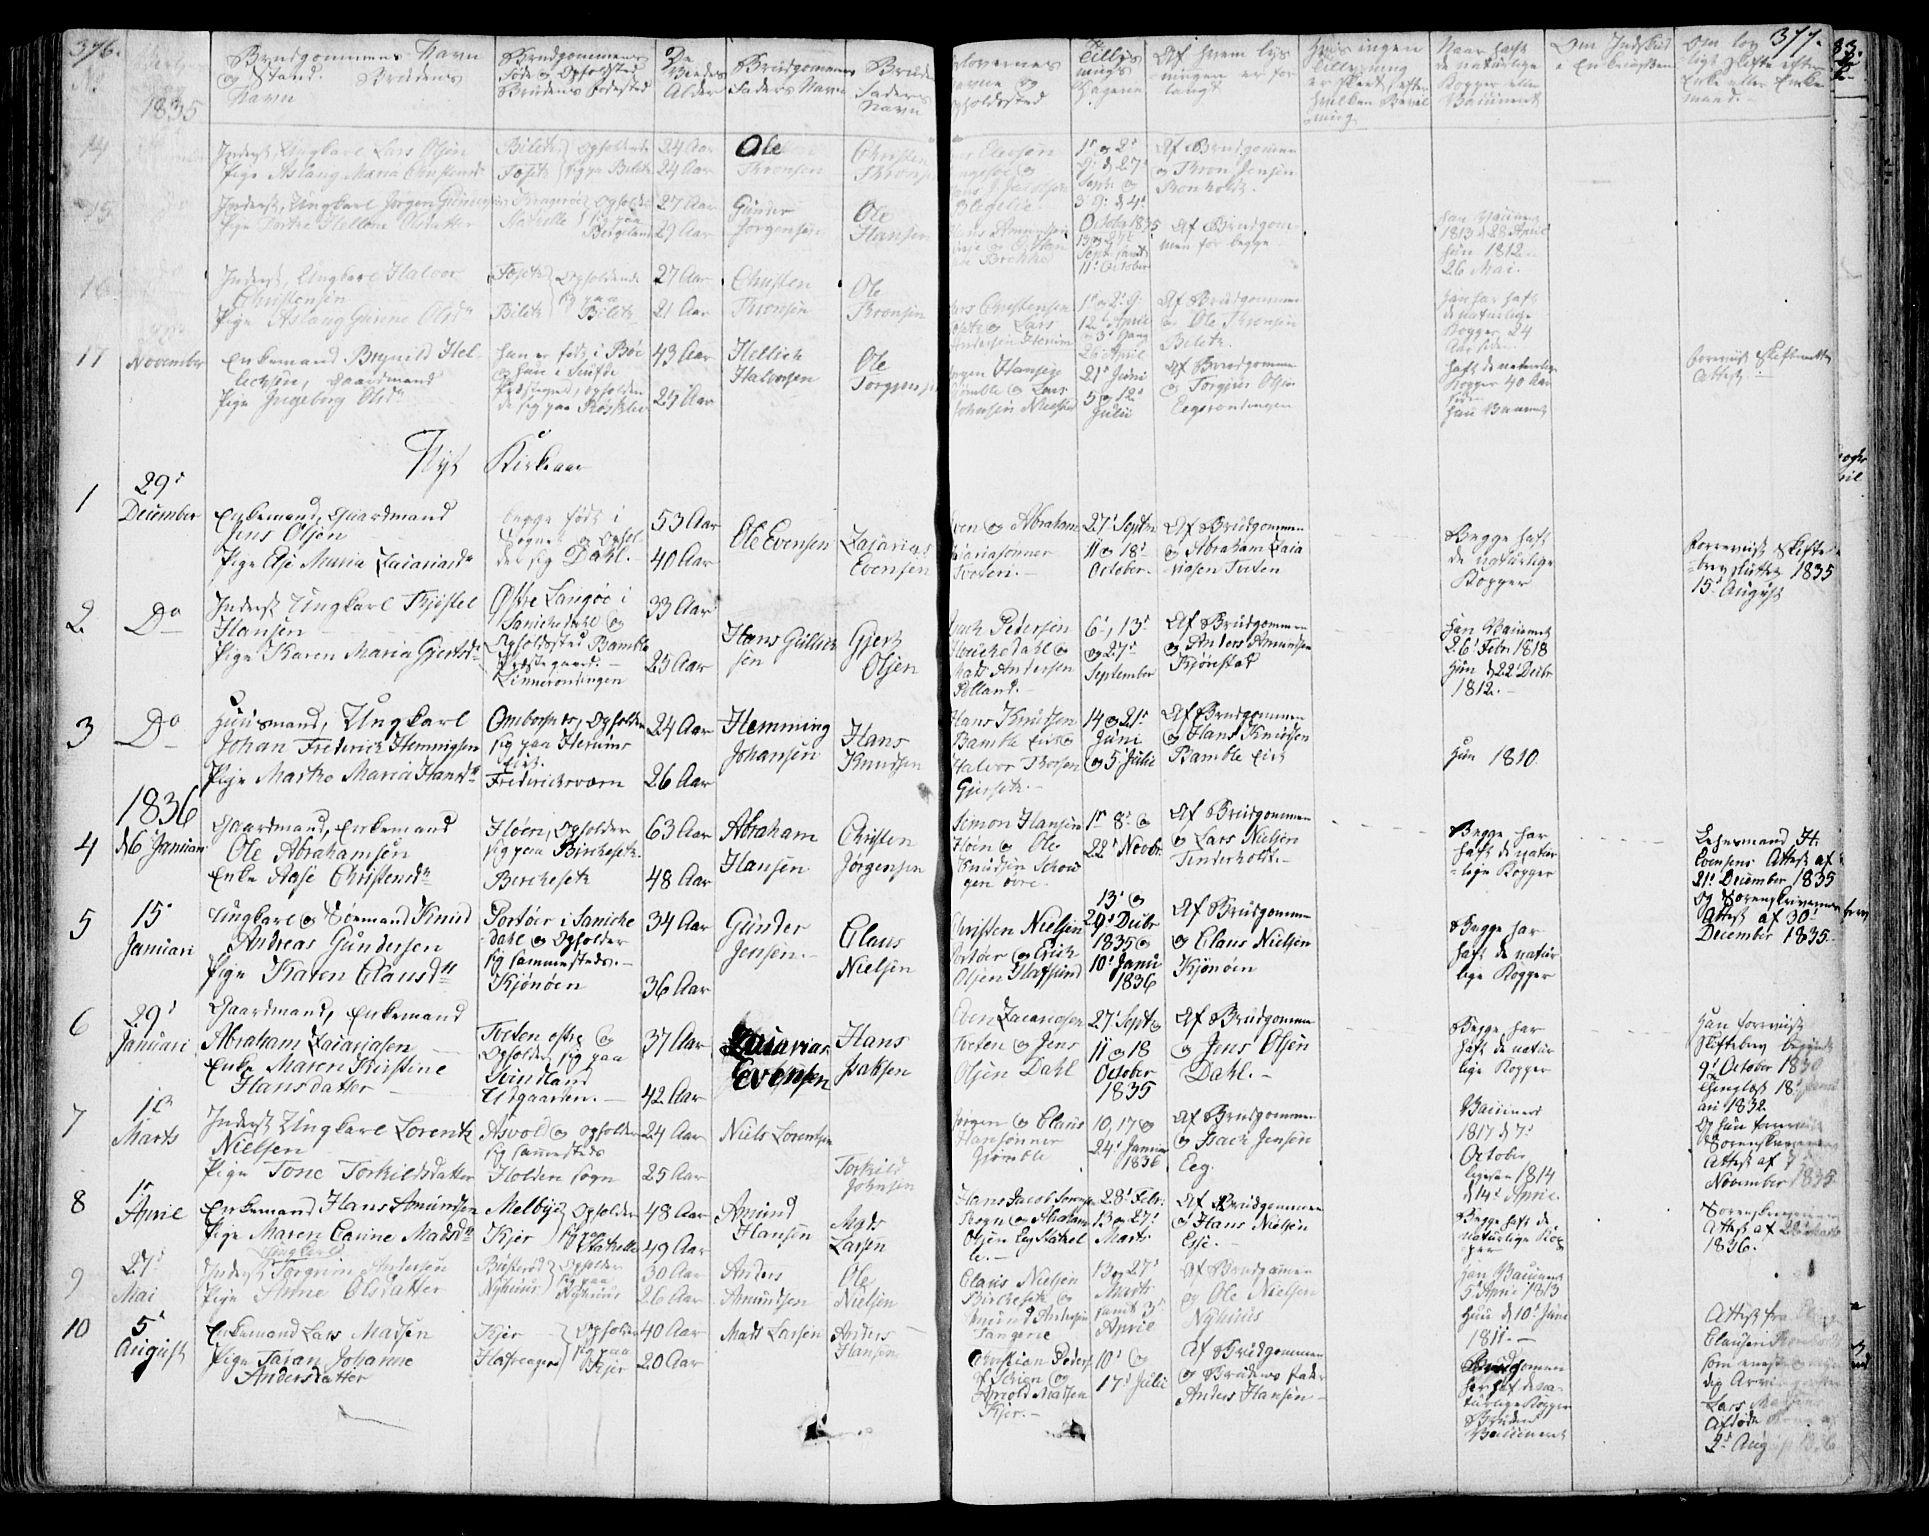 SAKO, Bamble kirkebøker, F/Fa/L0004: Ministerialbok nr. I 4, 1834-1853, s. 376-377